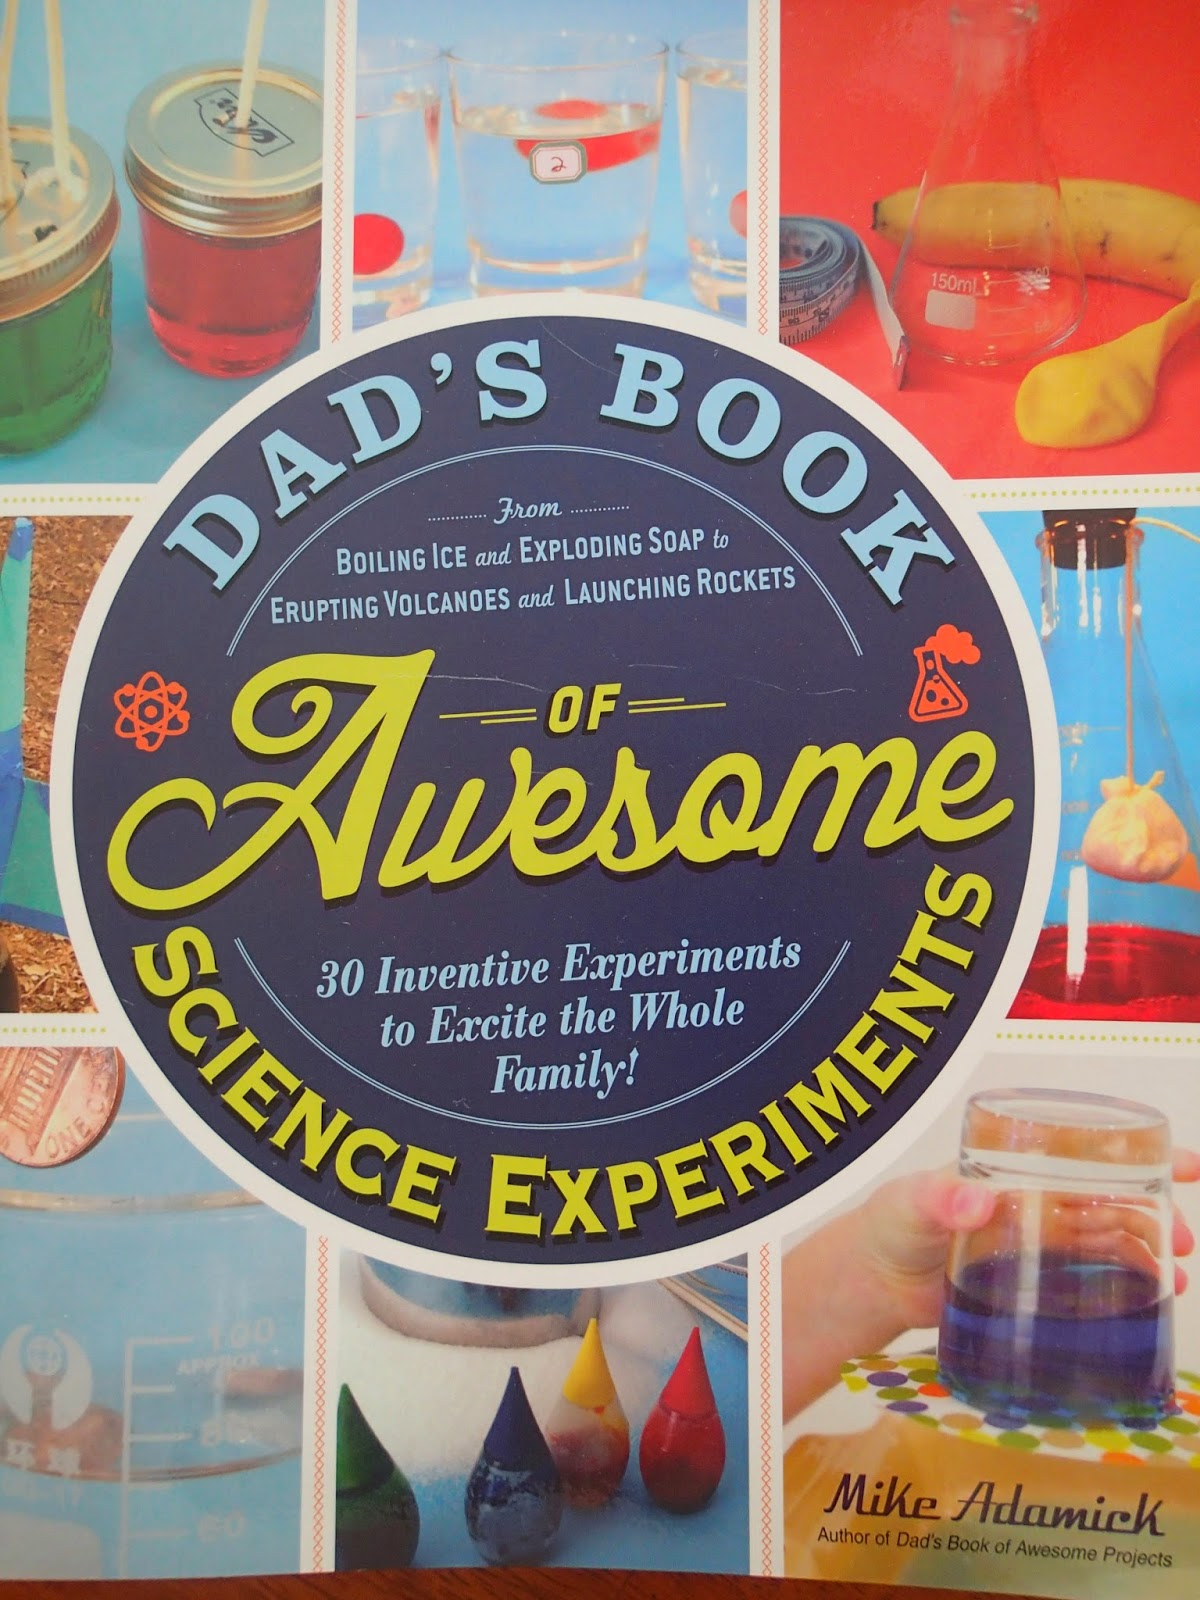 2014-06-12-dadsbookofawesomescienceexperiments.JPG